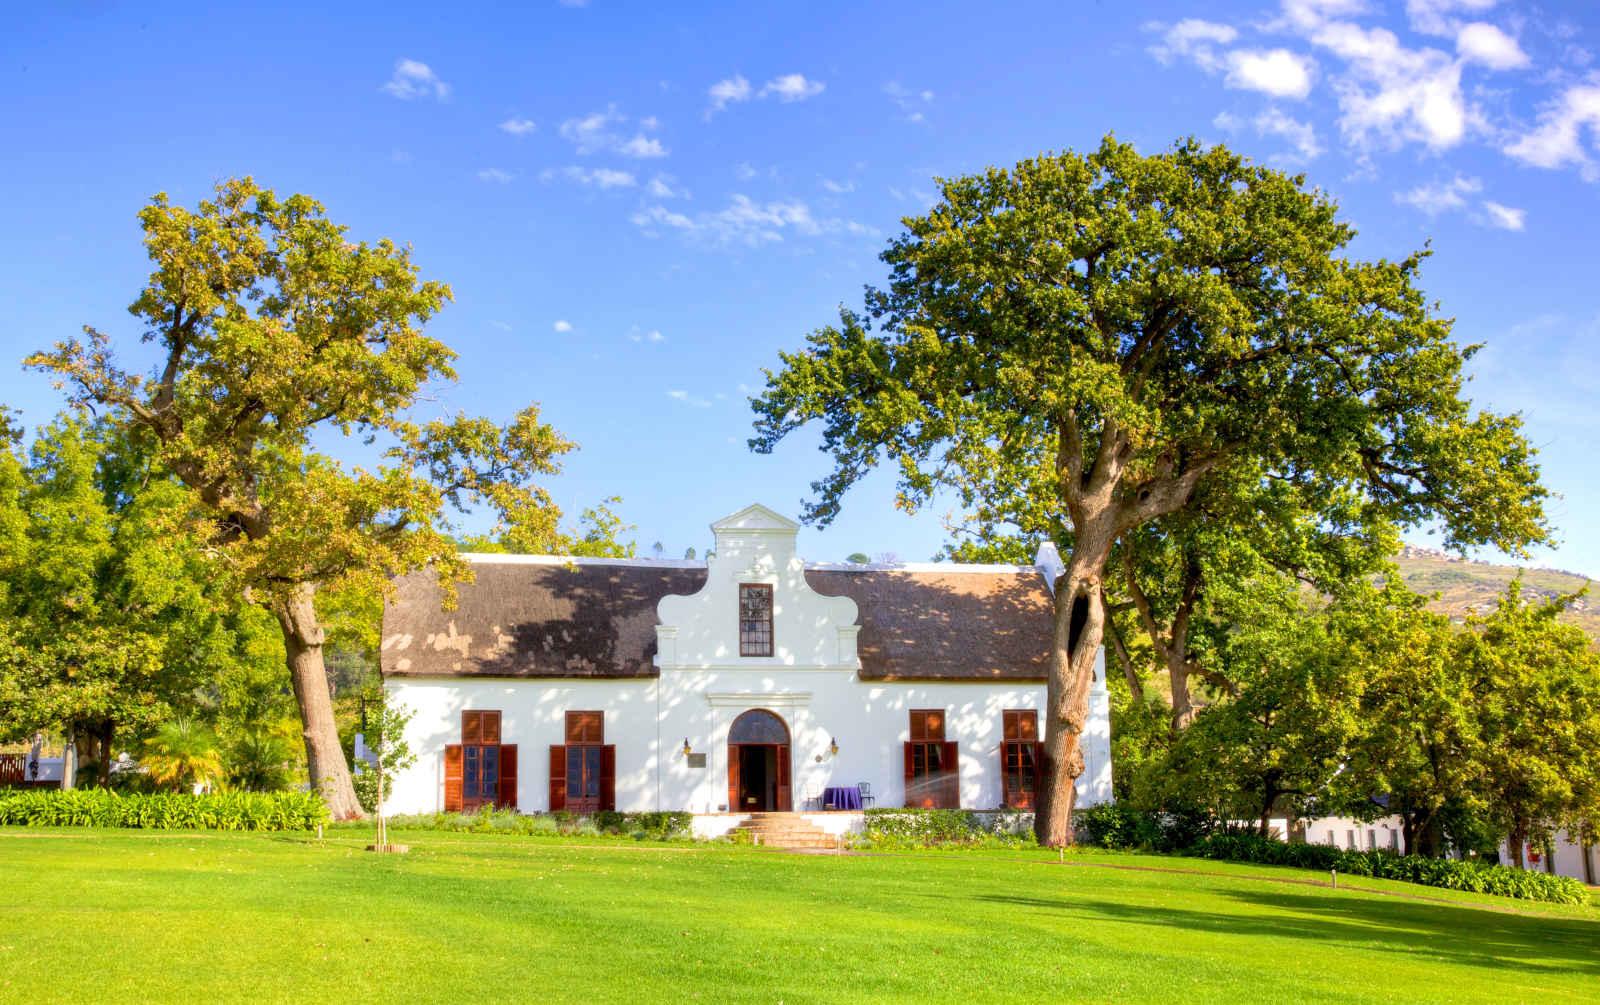 Afrique du Sud - Swaziland-Eswatini - Circuit Sud Africana